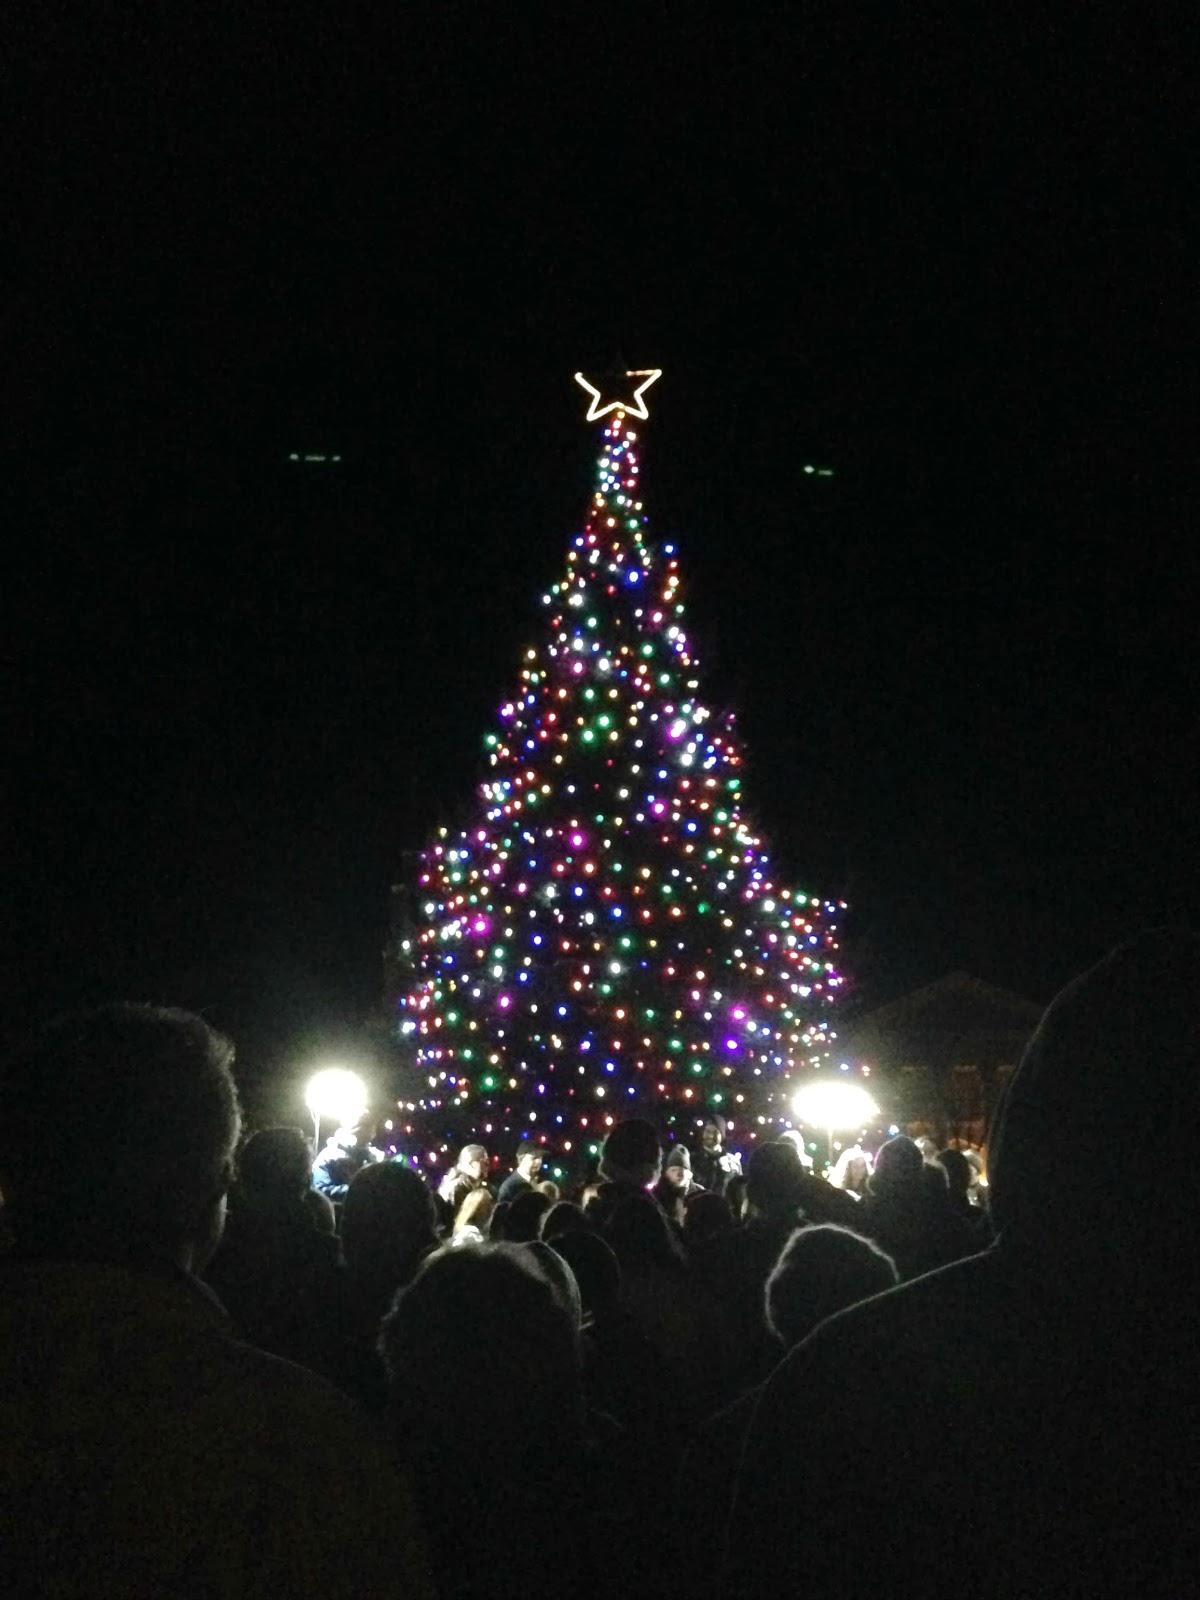 the hawkins family: Dartmouth Tree Lighting